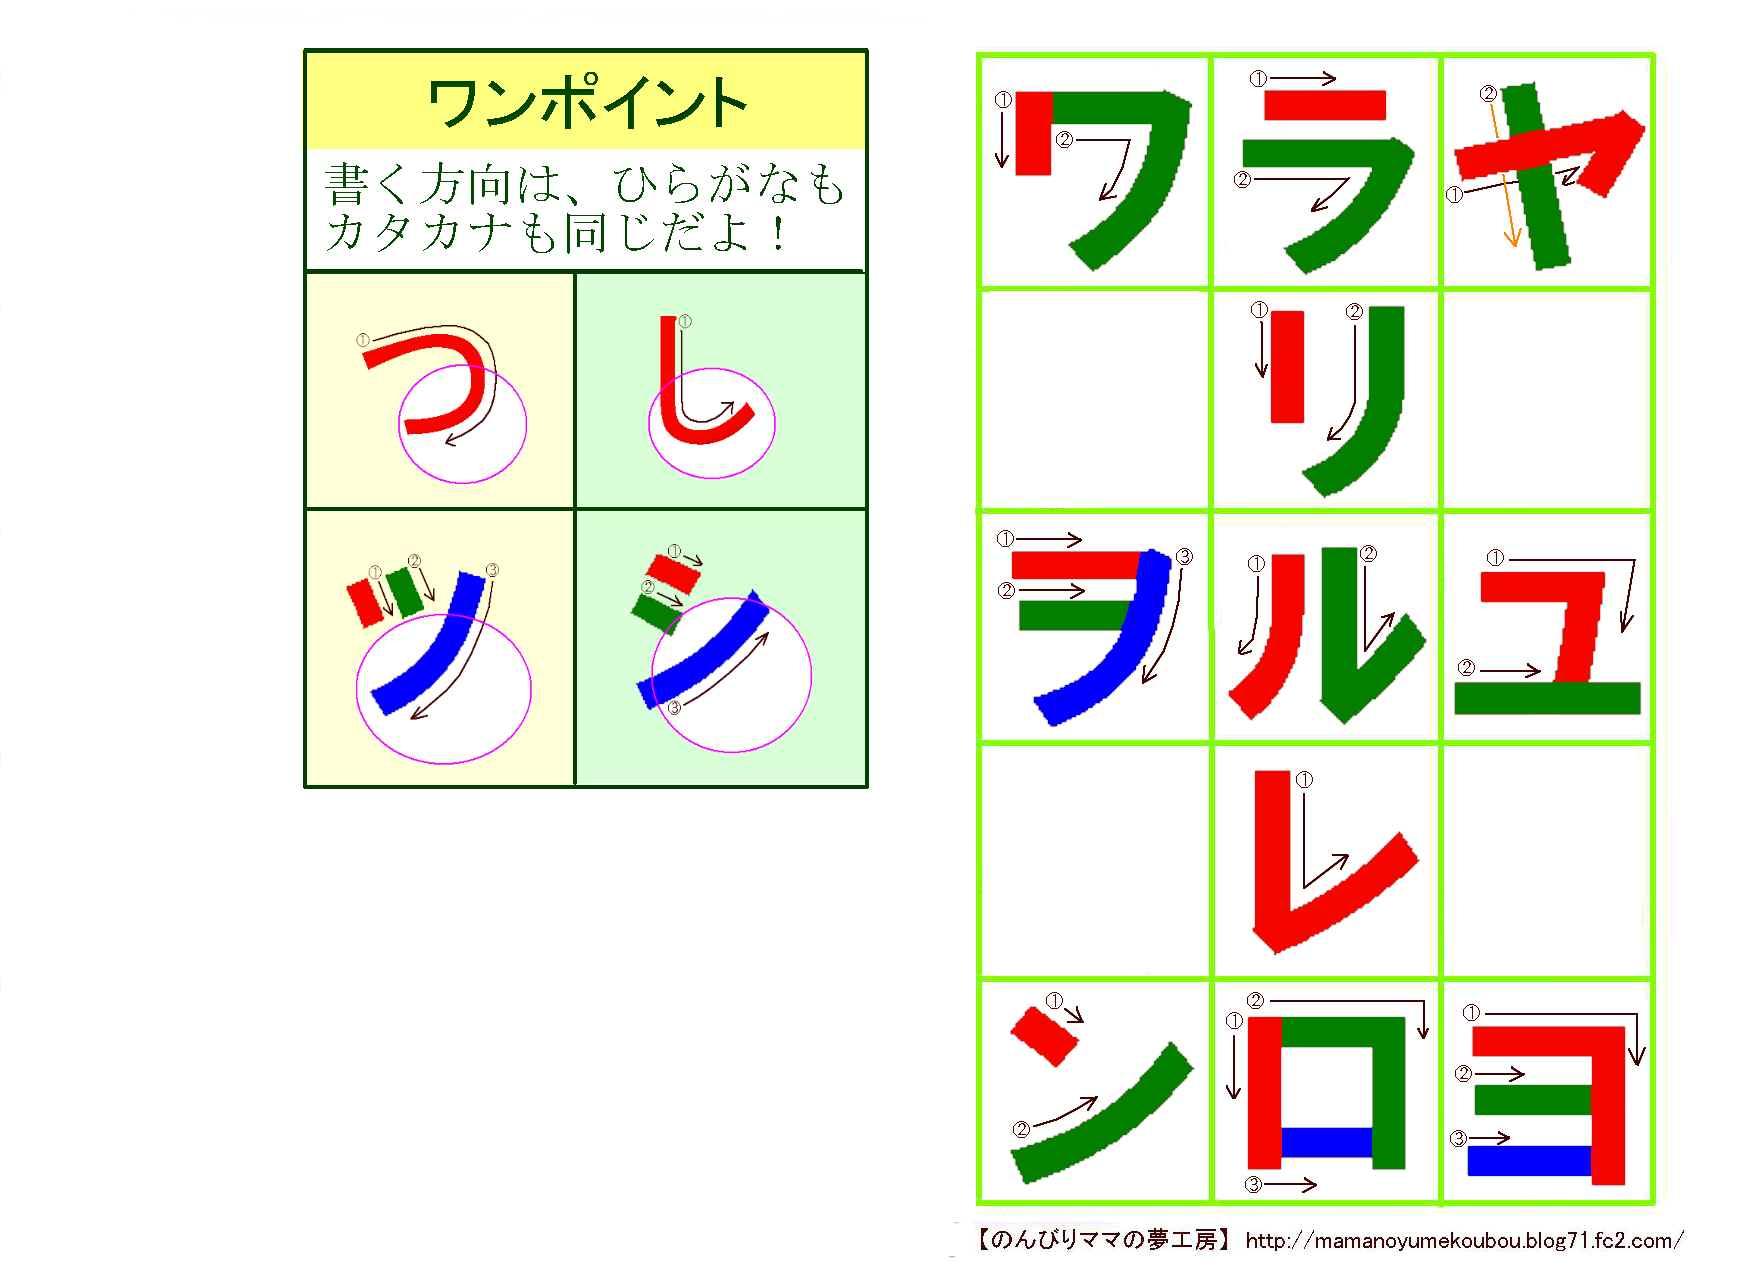 Katakana Stroke Order Chart : 子供 ひらがな 練習 : ひらがな